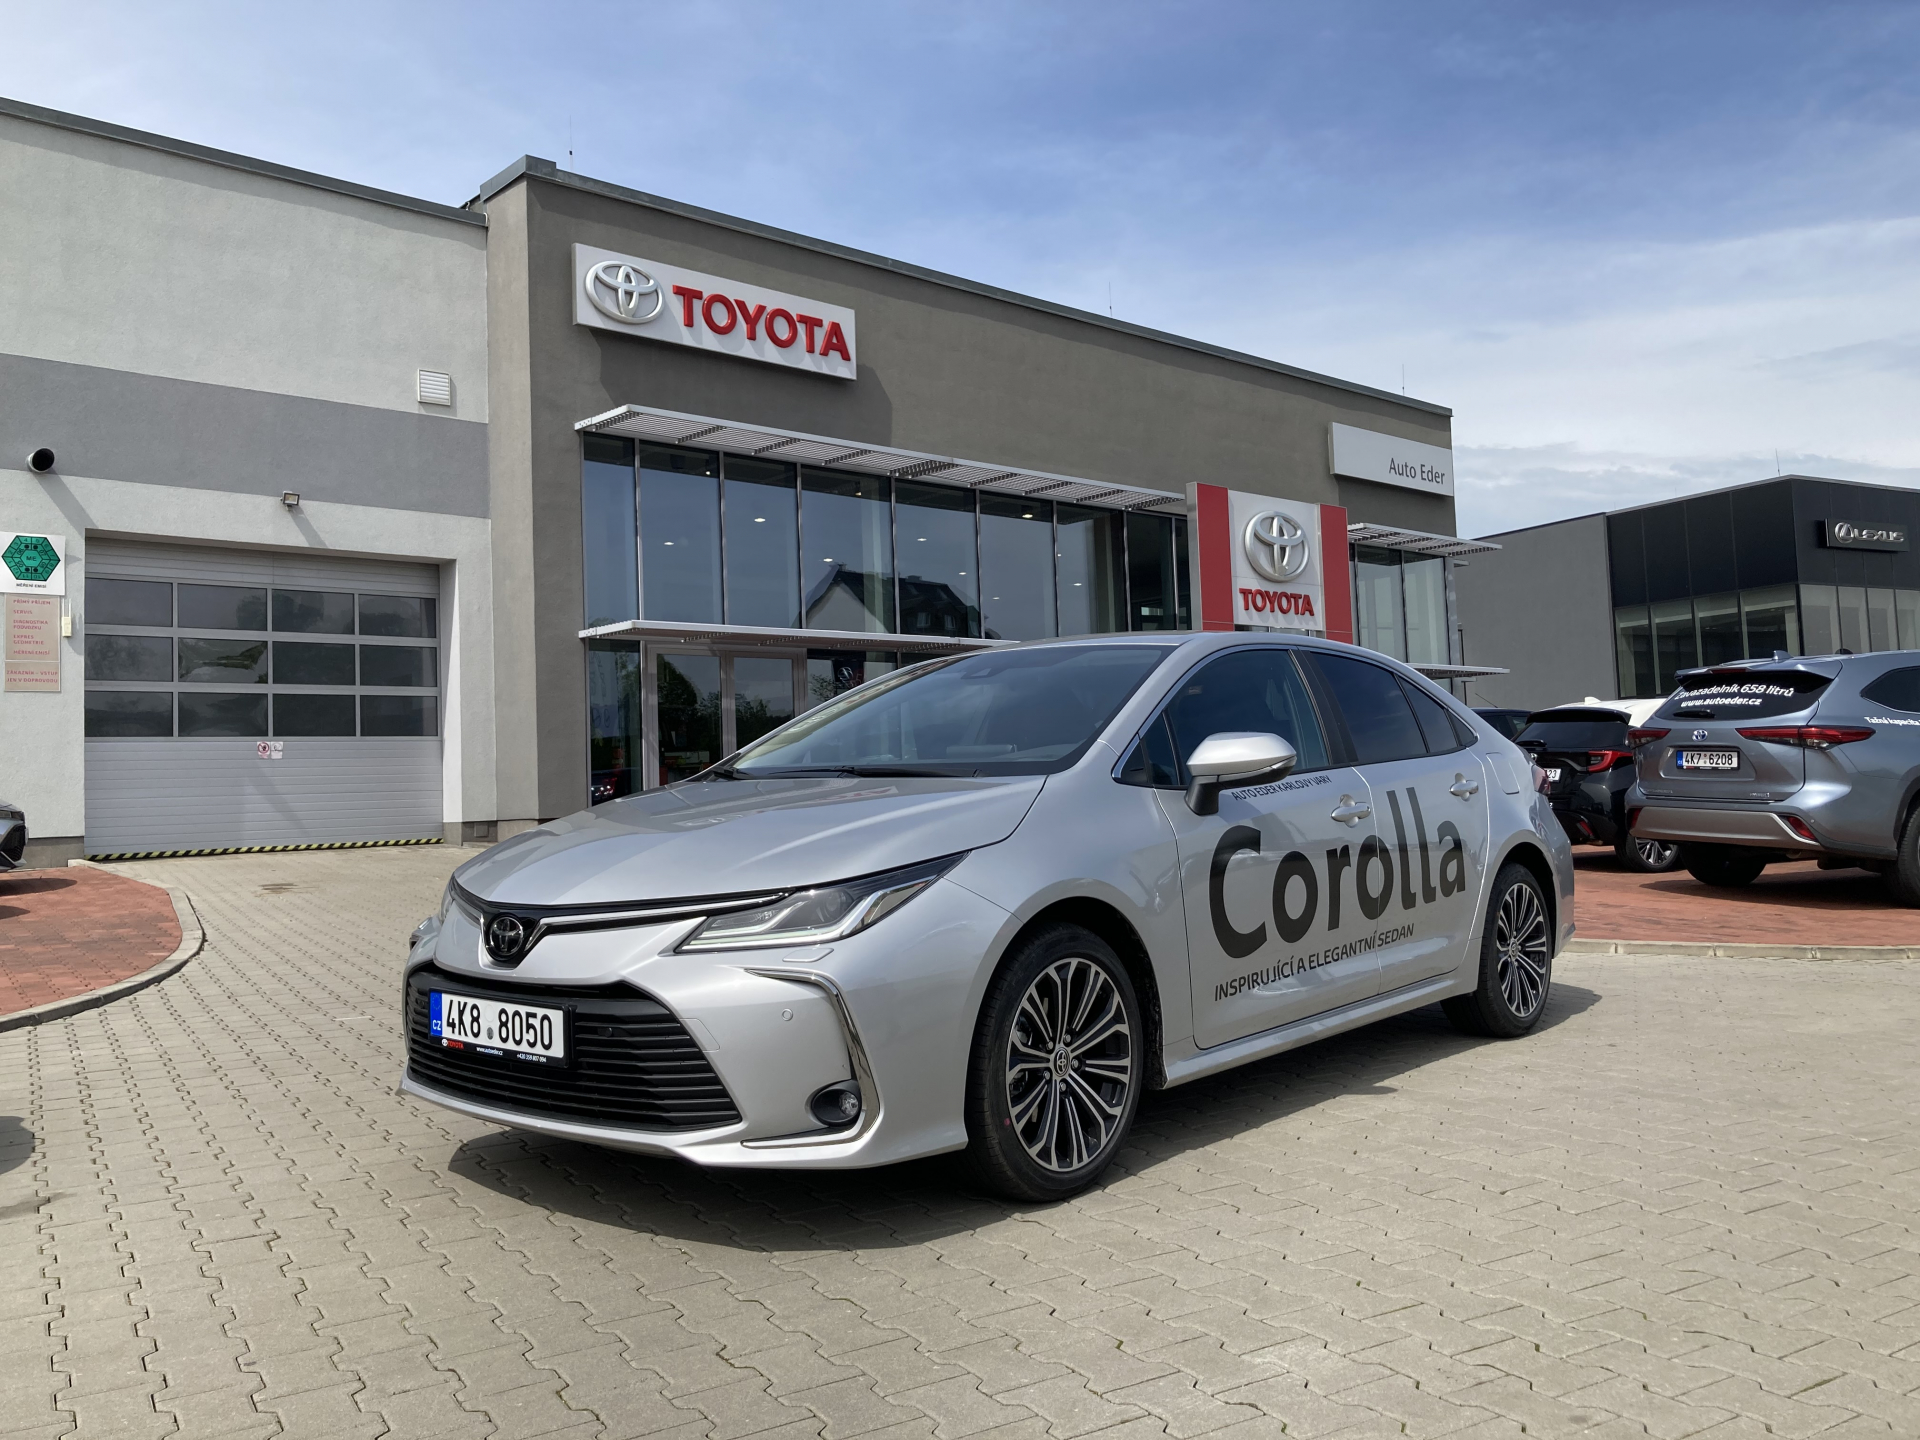 Toyota COROLLA Sedan 1.5 Dynamic Force (123 k) 6st. man. převodovka Comfort